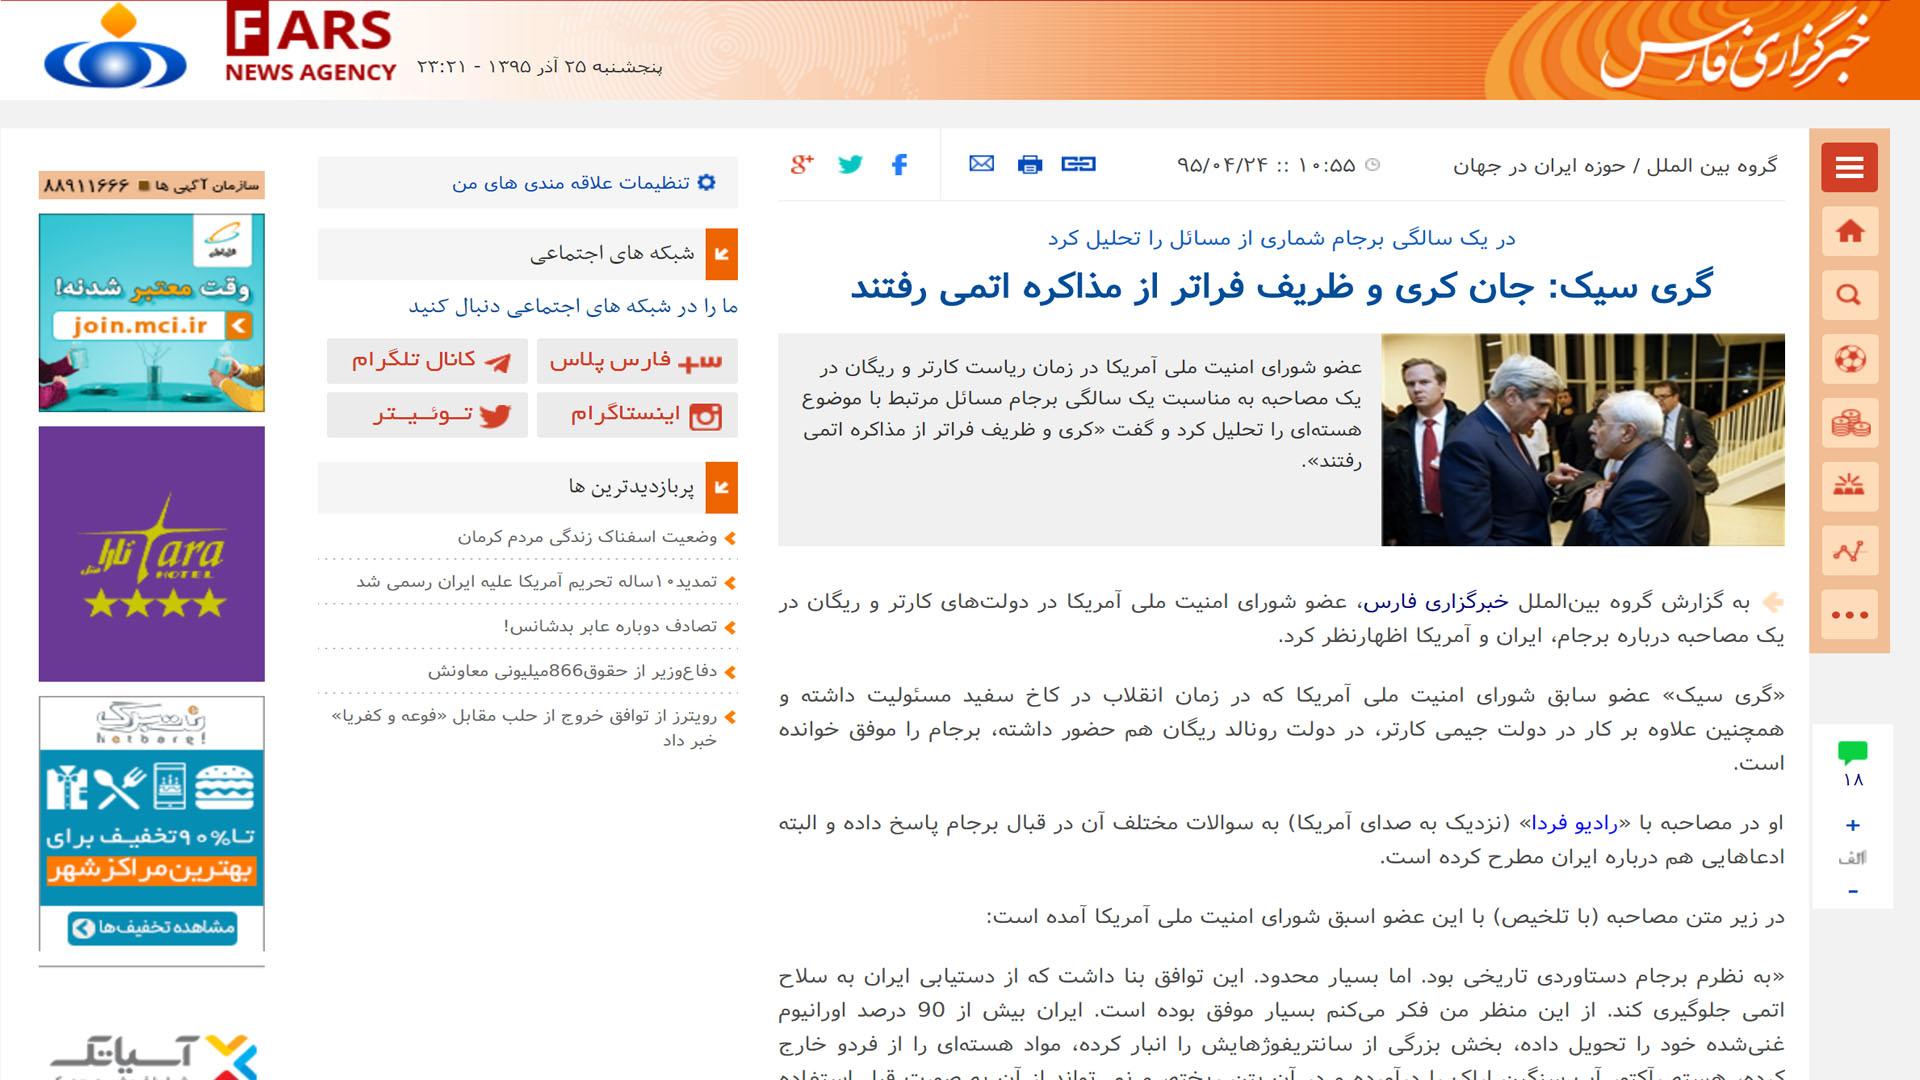 Iranian media links Radio Farda, a rare occurance